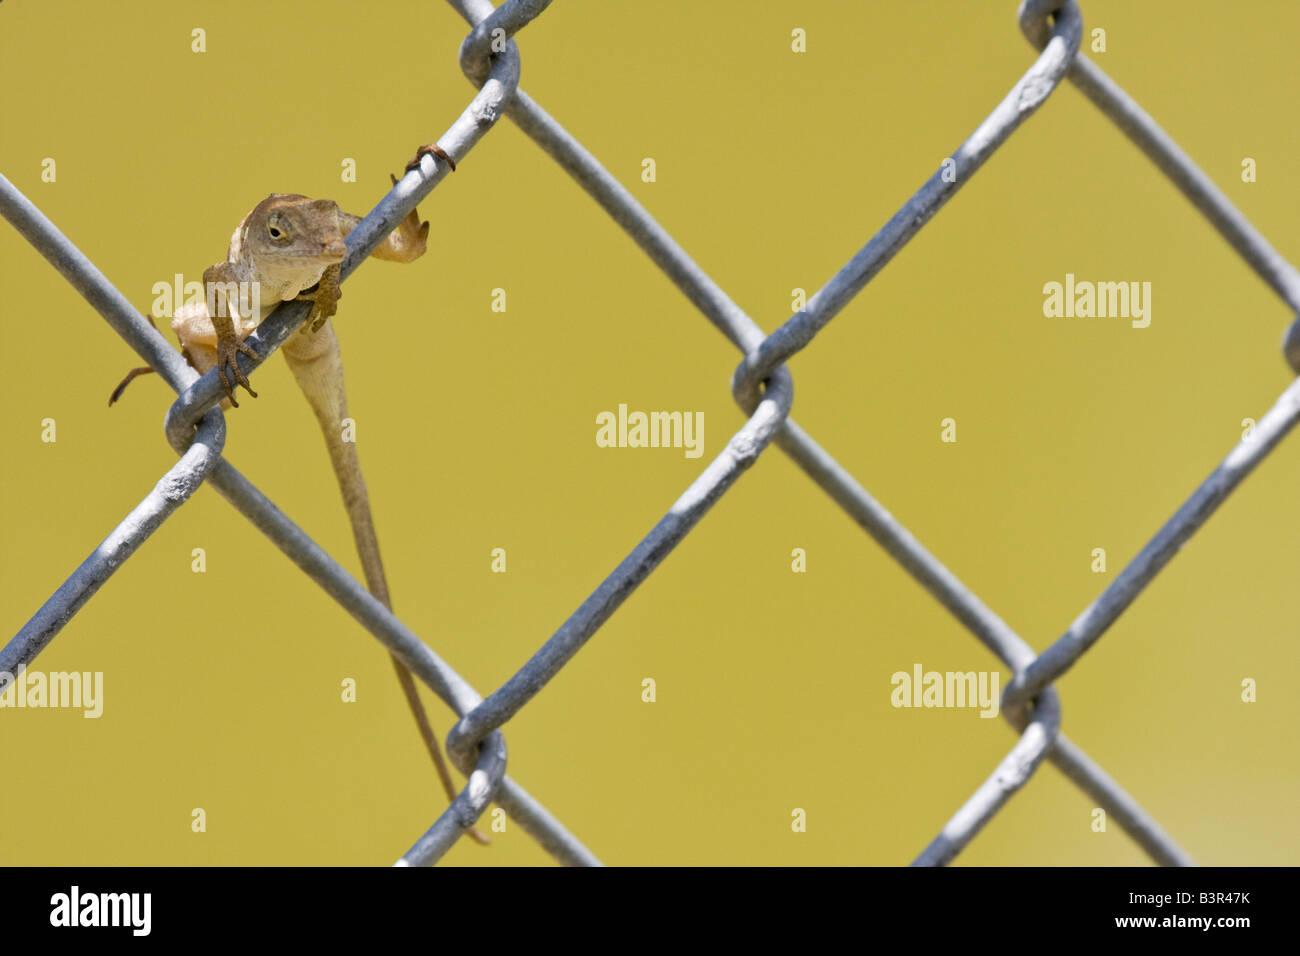 Small Brown Lizard Stockfotos & Small Brown Lizard Bilder - Alamy